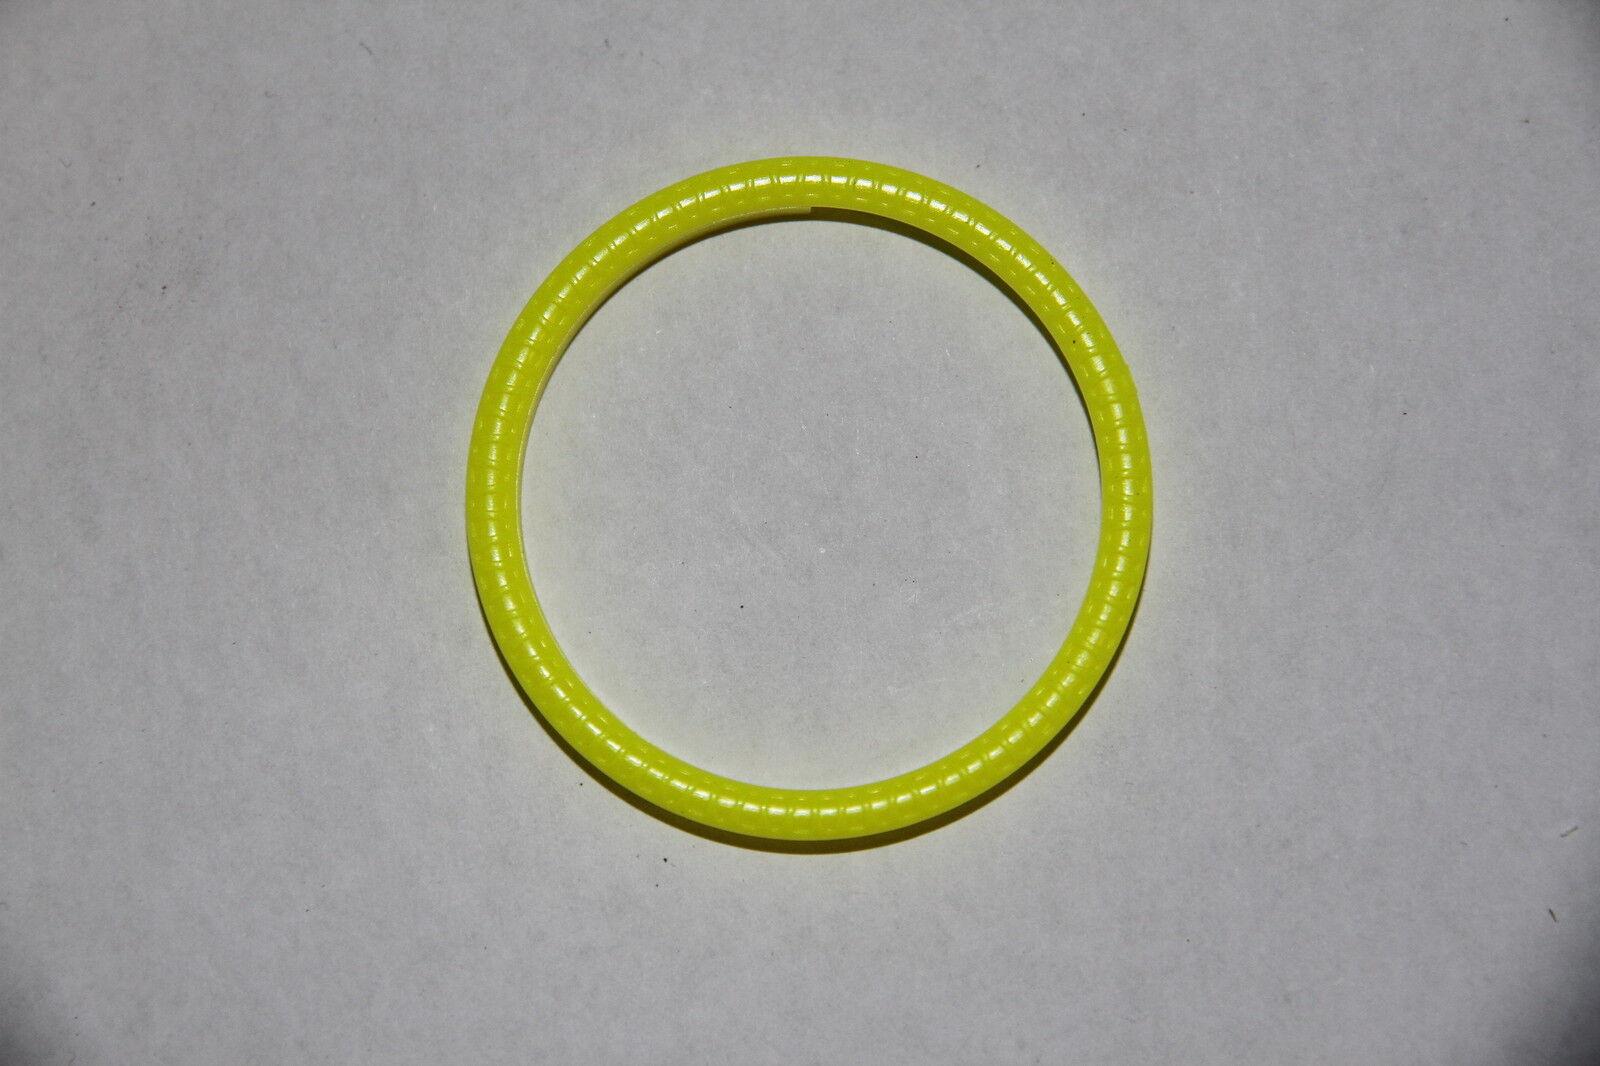 Bague Or Noir vue jaune jaune jaune grand chien (2